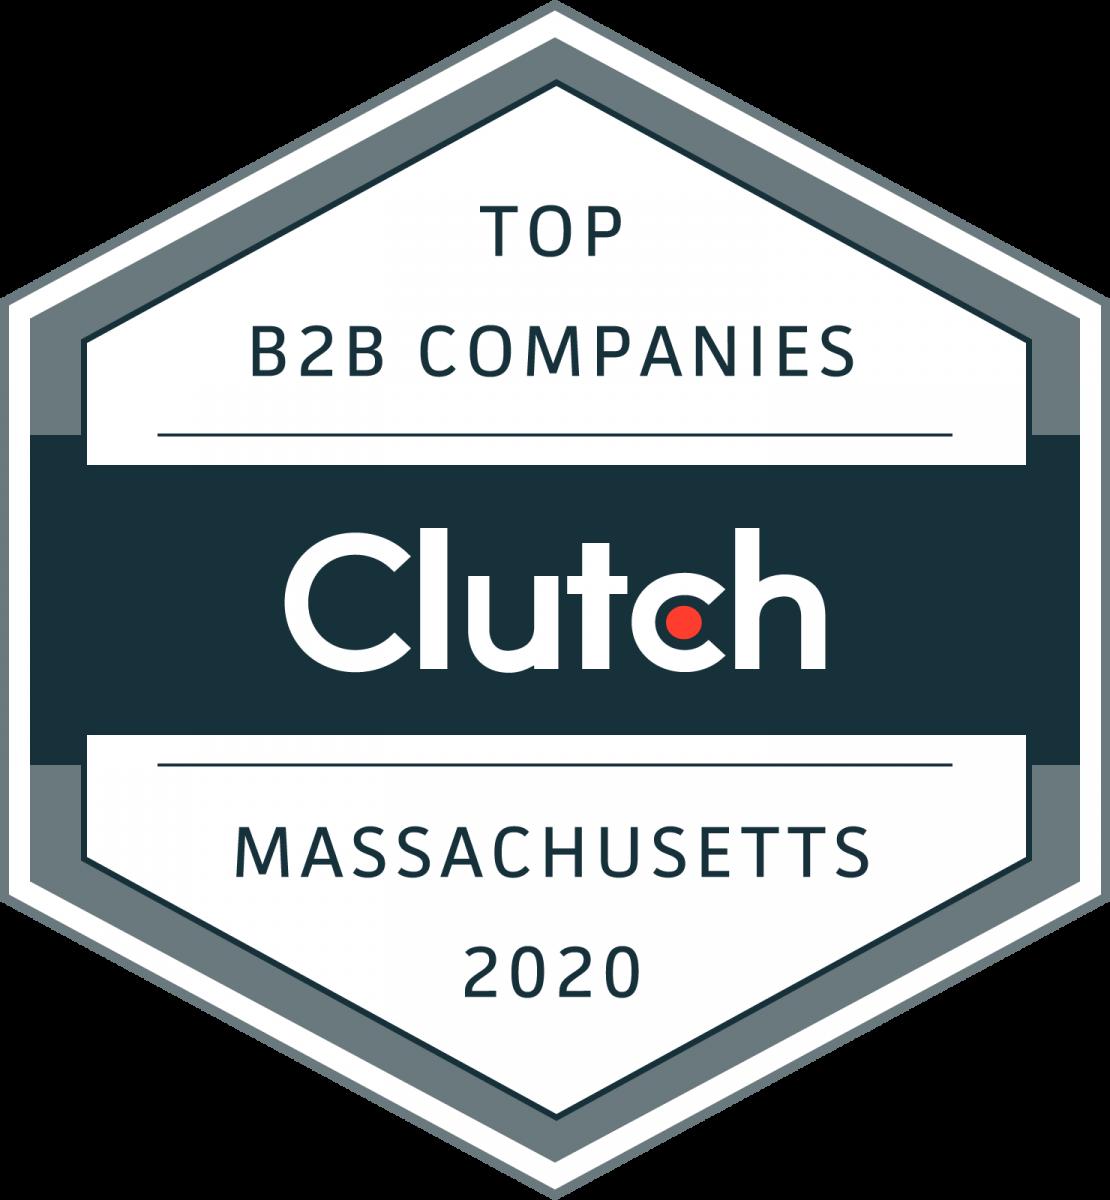 Top B2B Companies Massachusetts